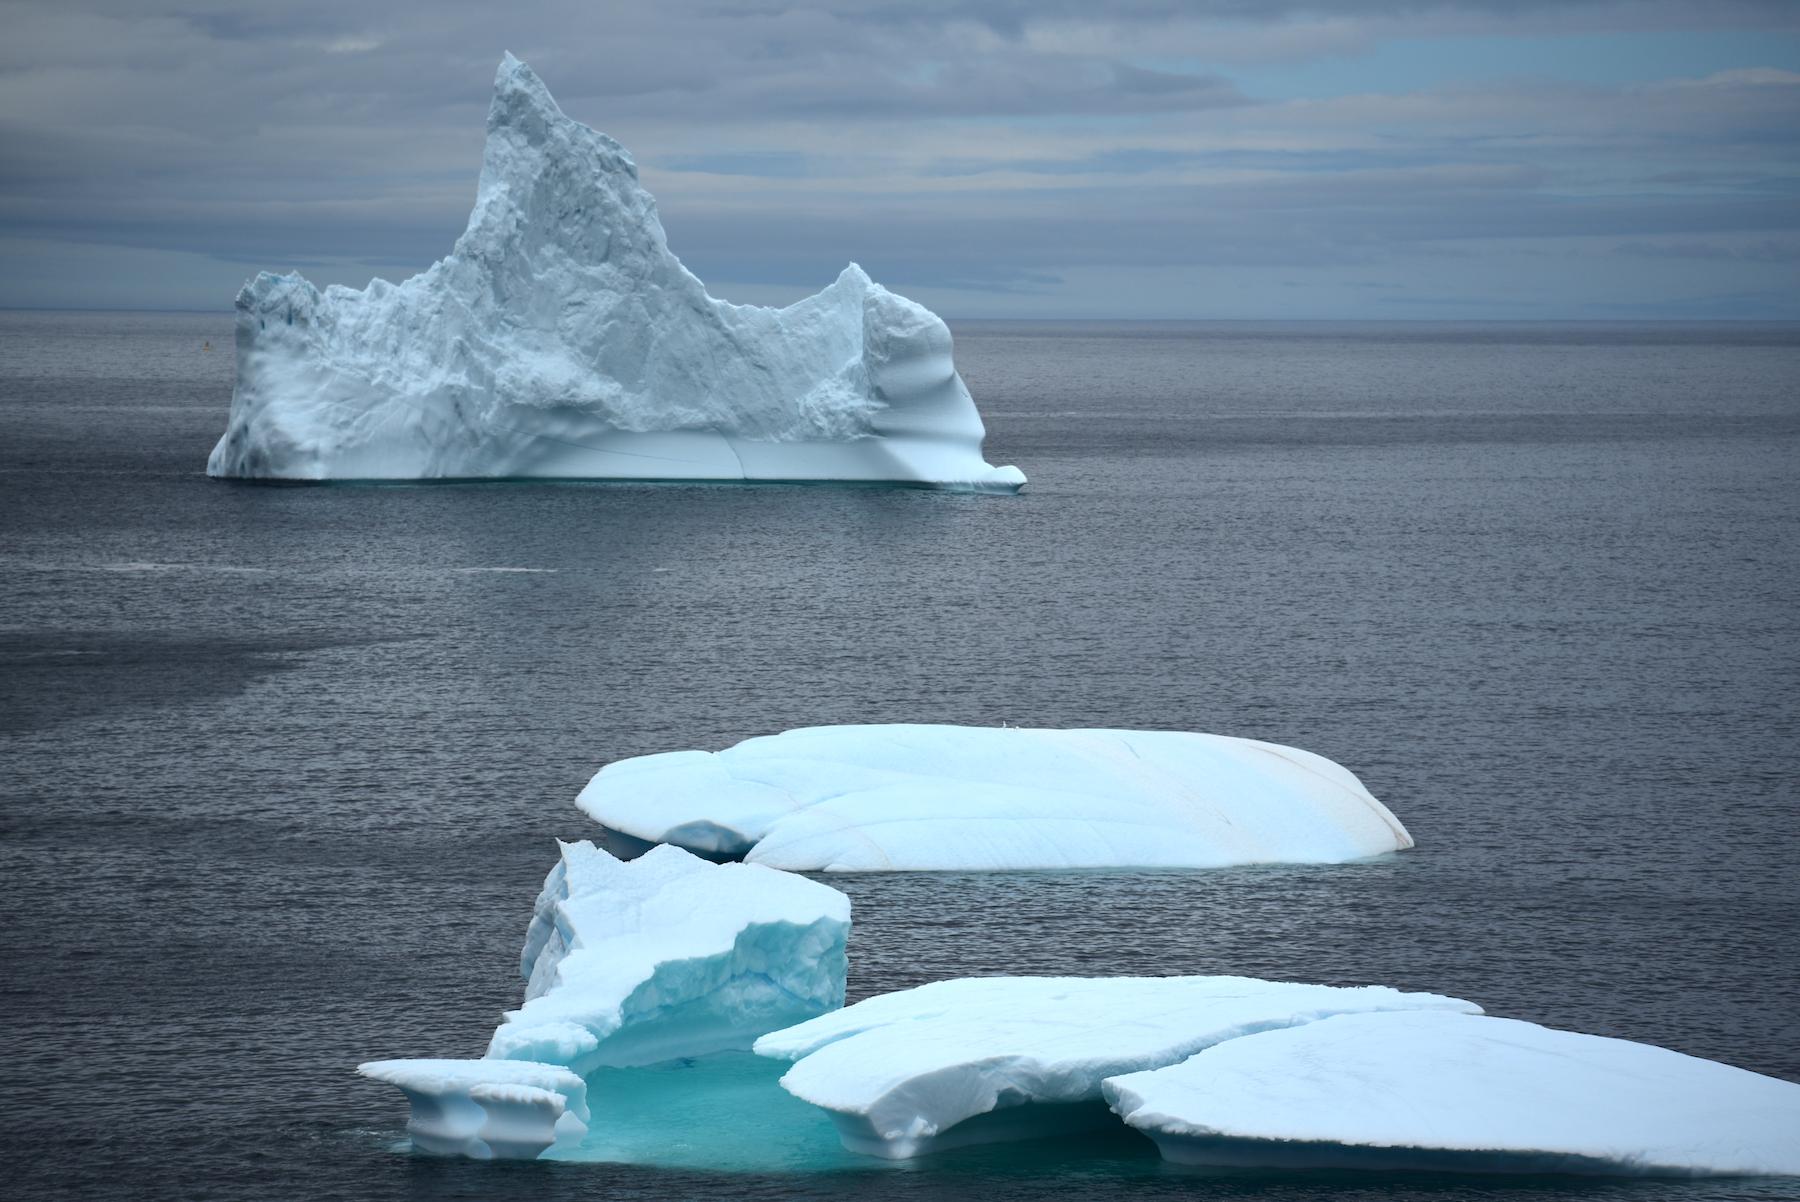 iceberg grates cove 1